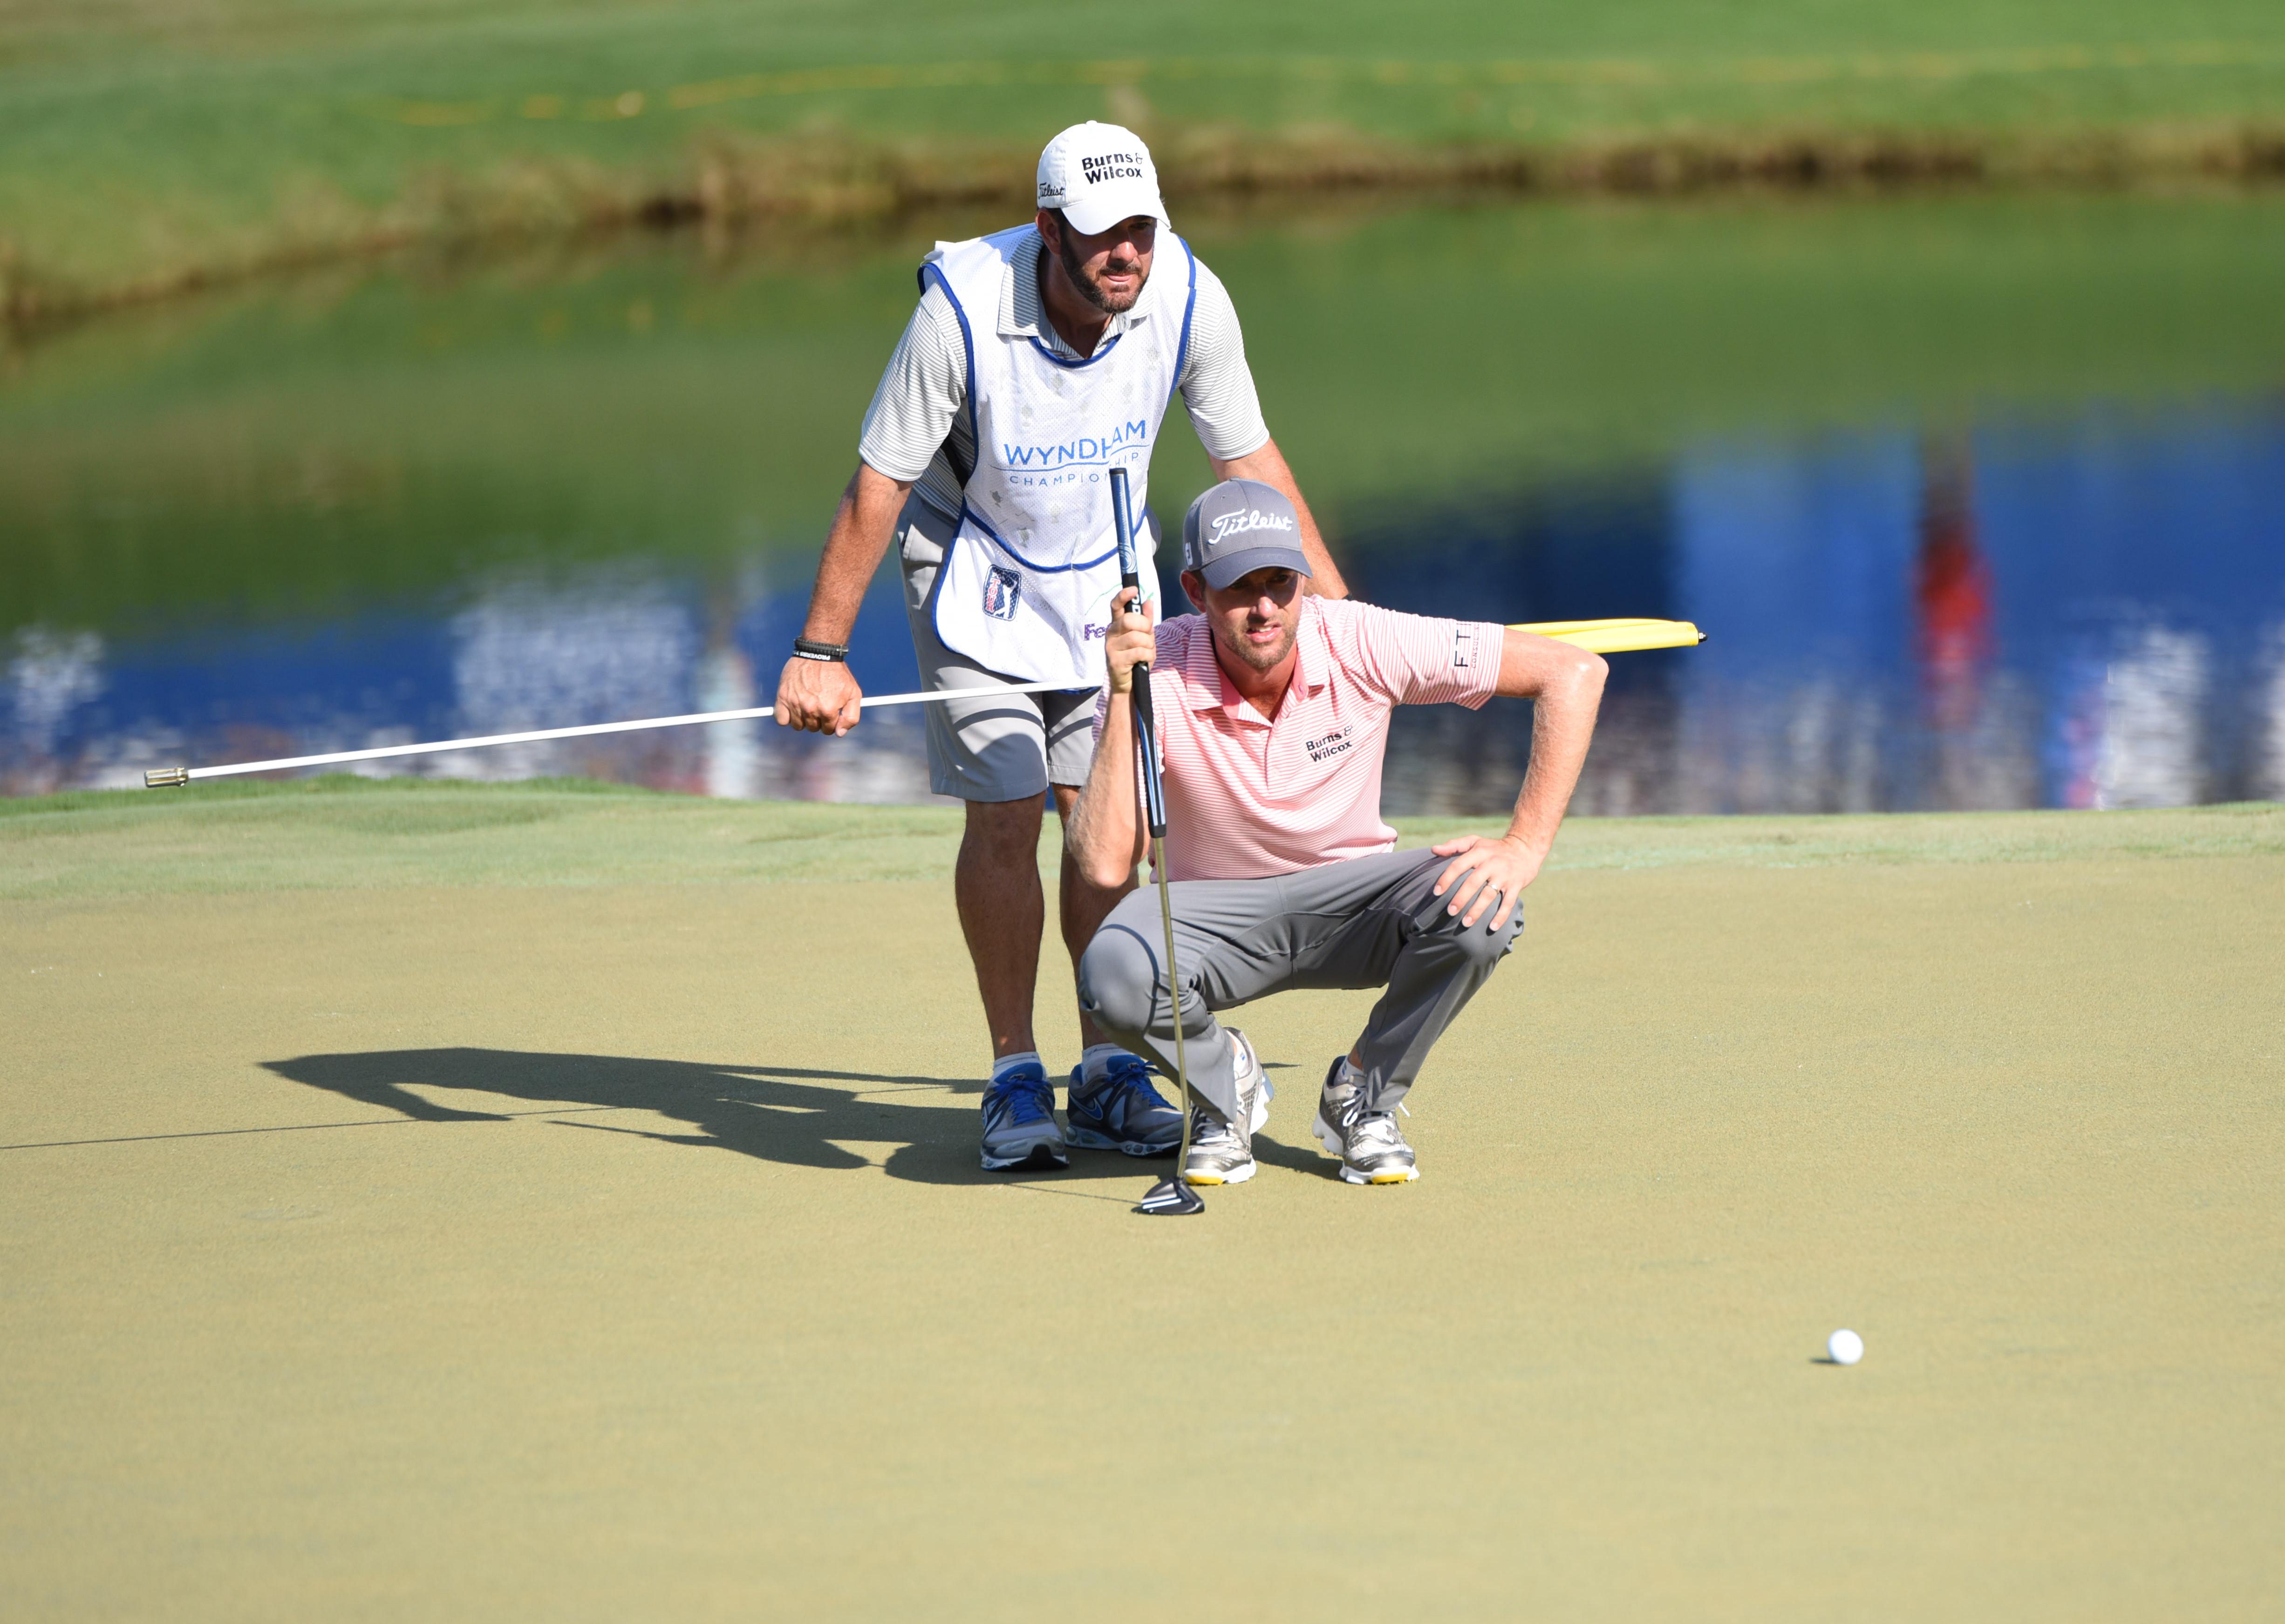 GOLF: AUG 19 PGA - Wyndham Championship - Third Round